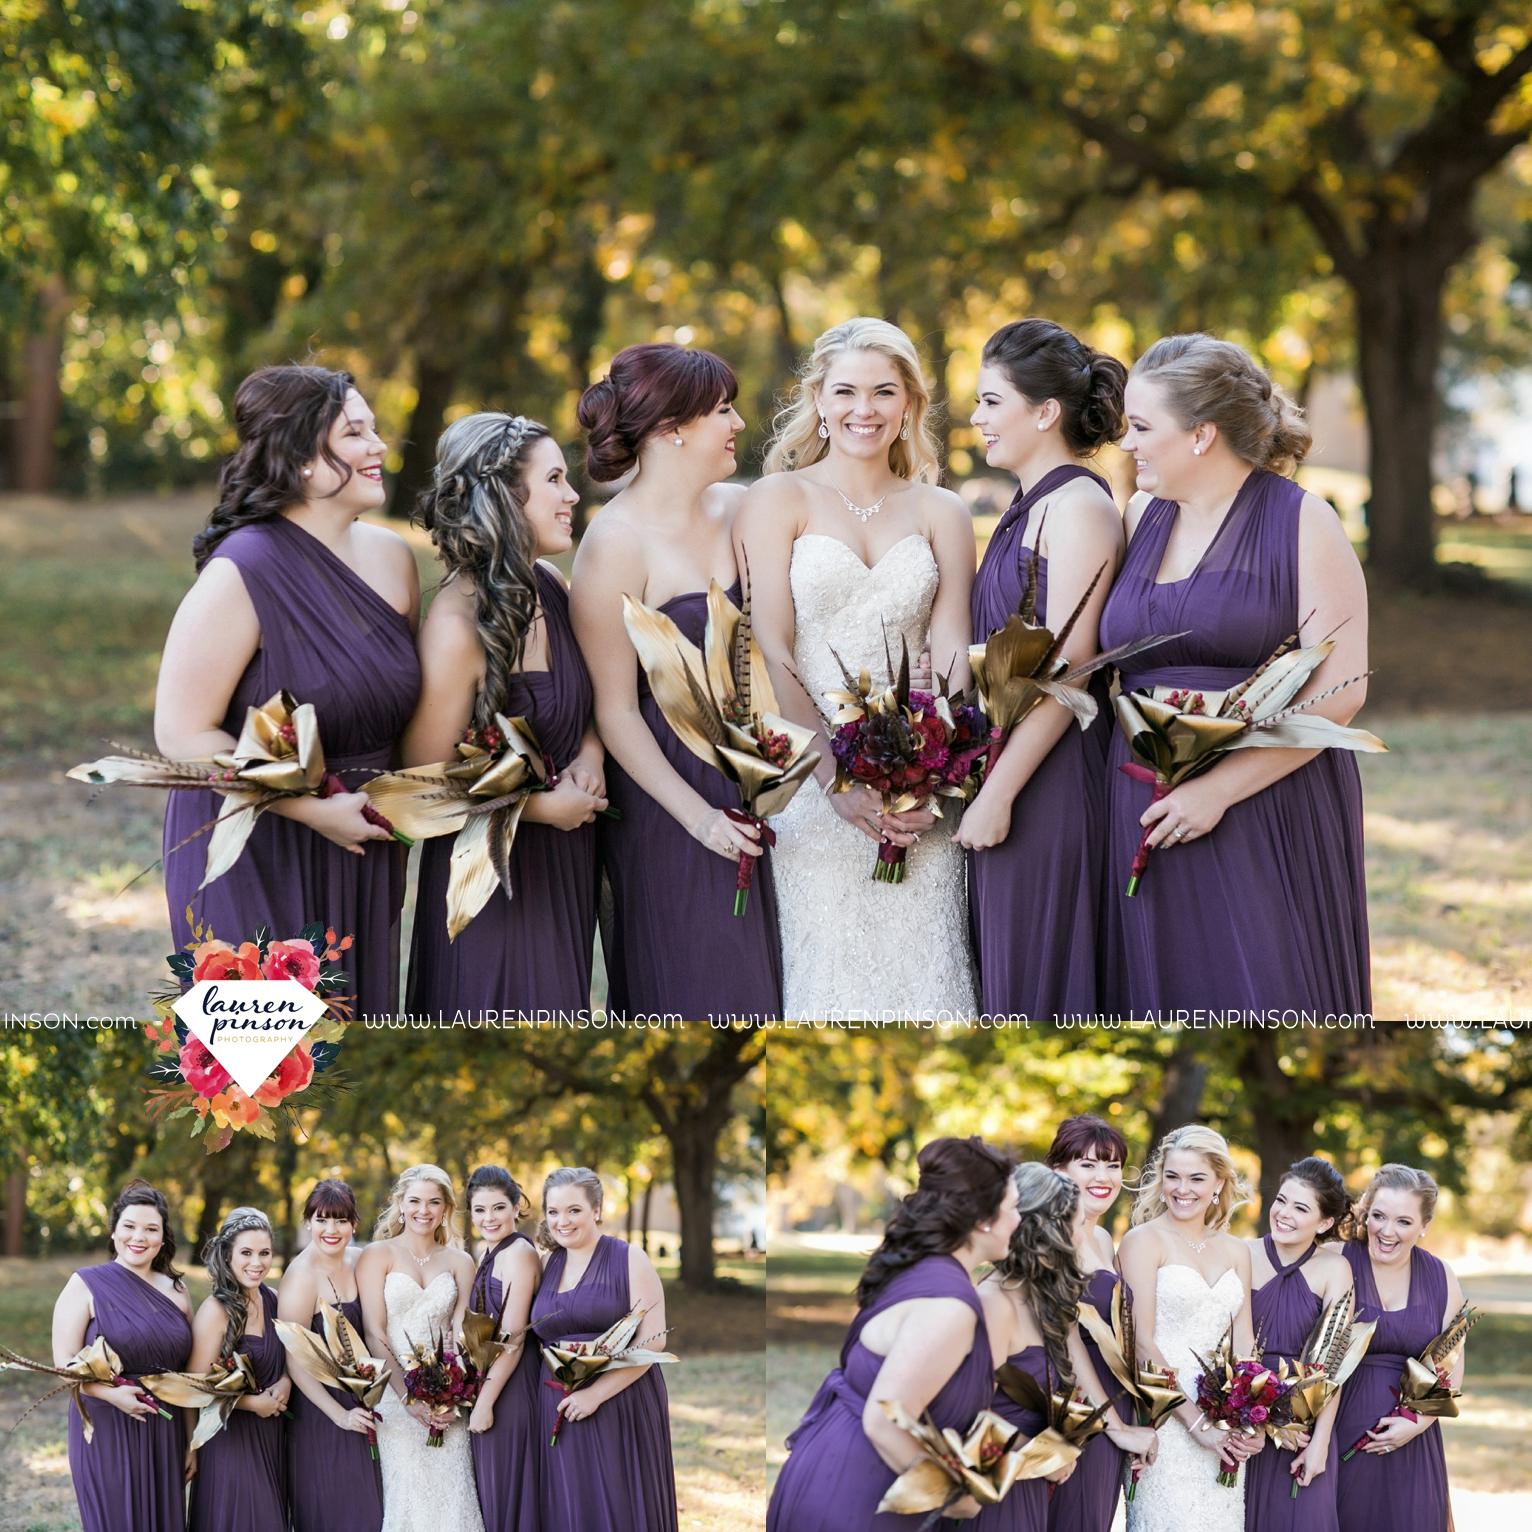 rustic-wichita-falls-texas-wedding-photographer-gold-glam-mayfield-events-market-street-united-allue-bridals-fall_1755.jpg